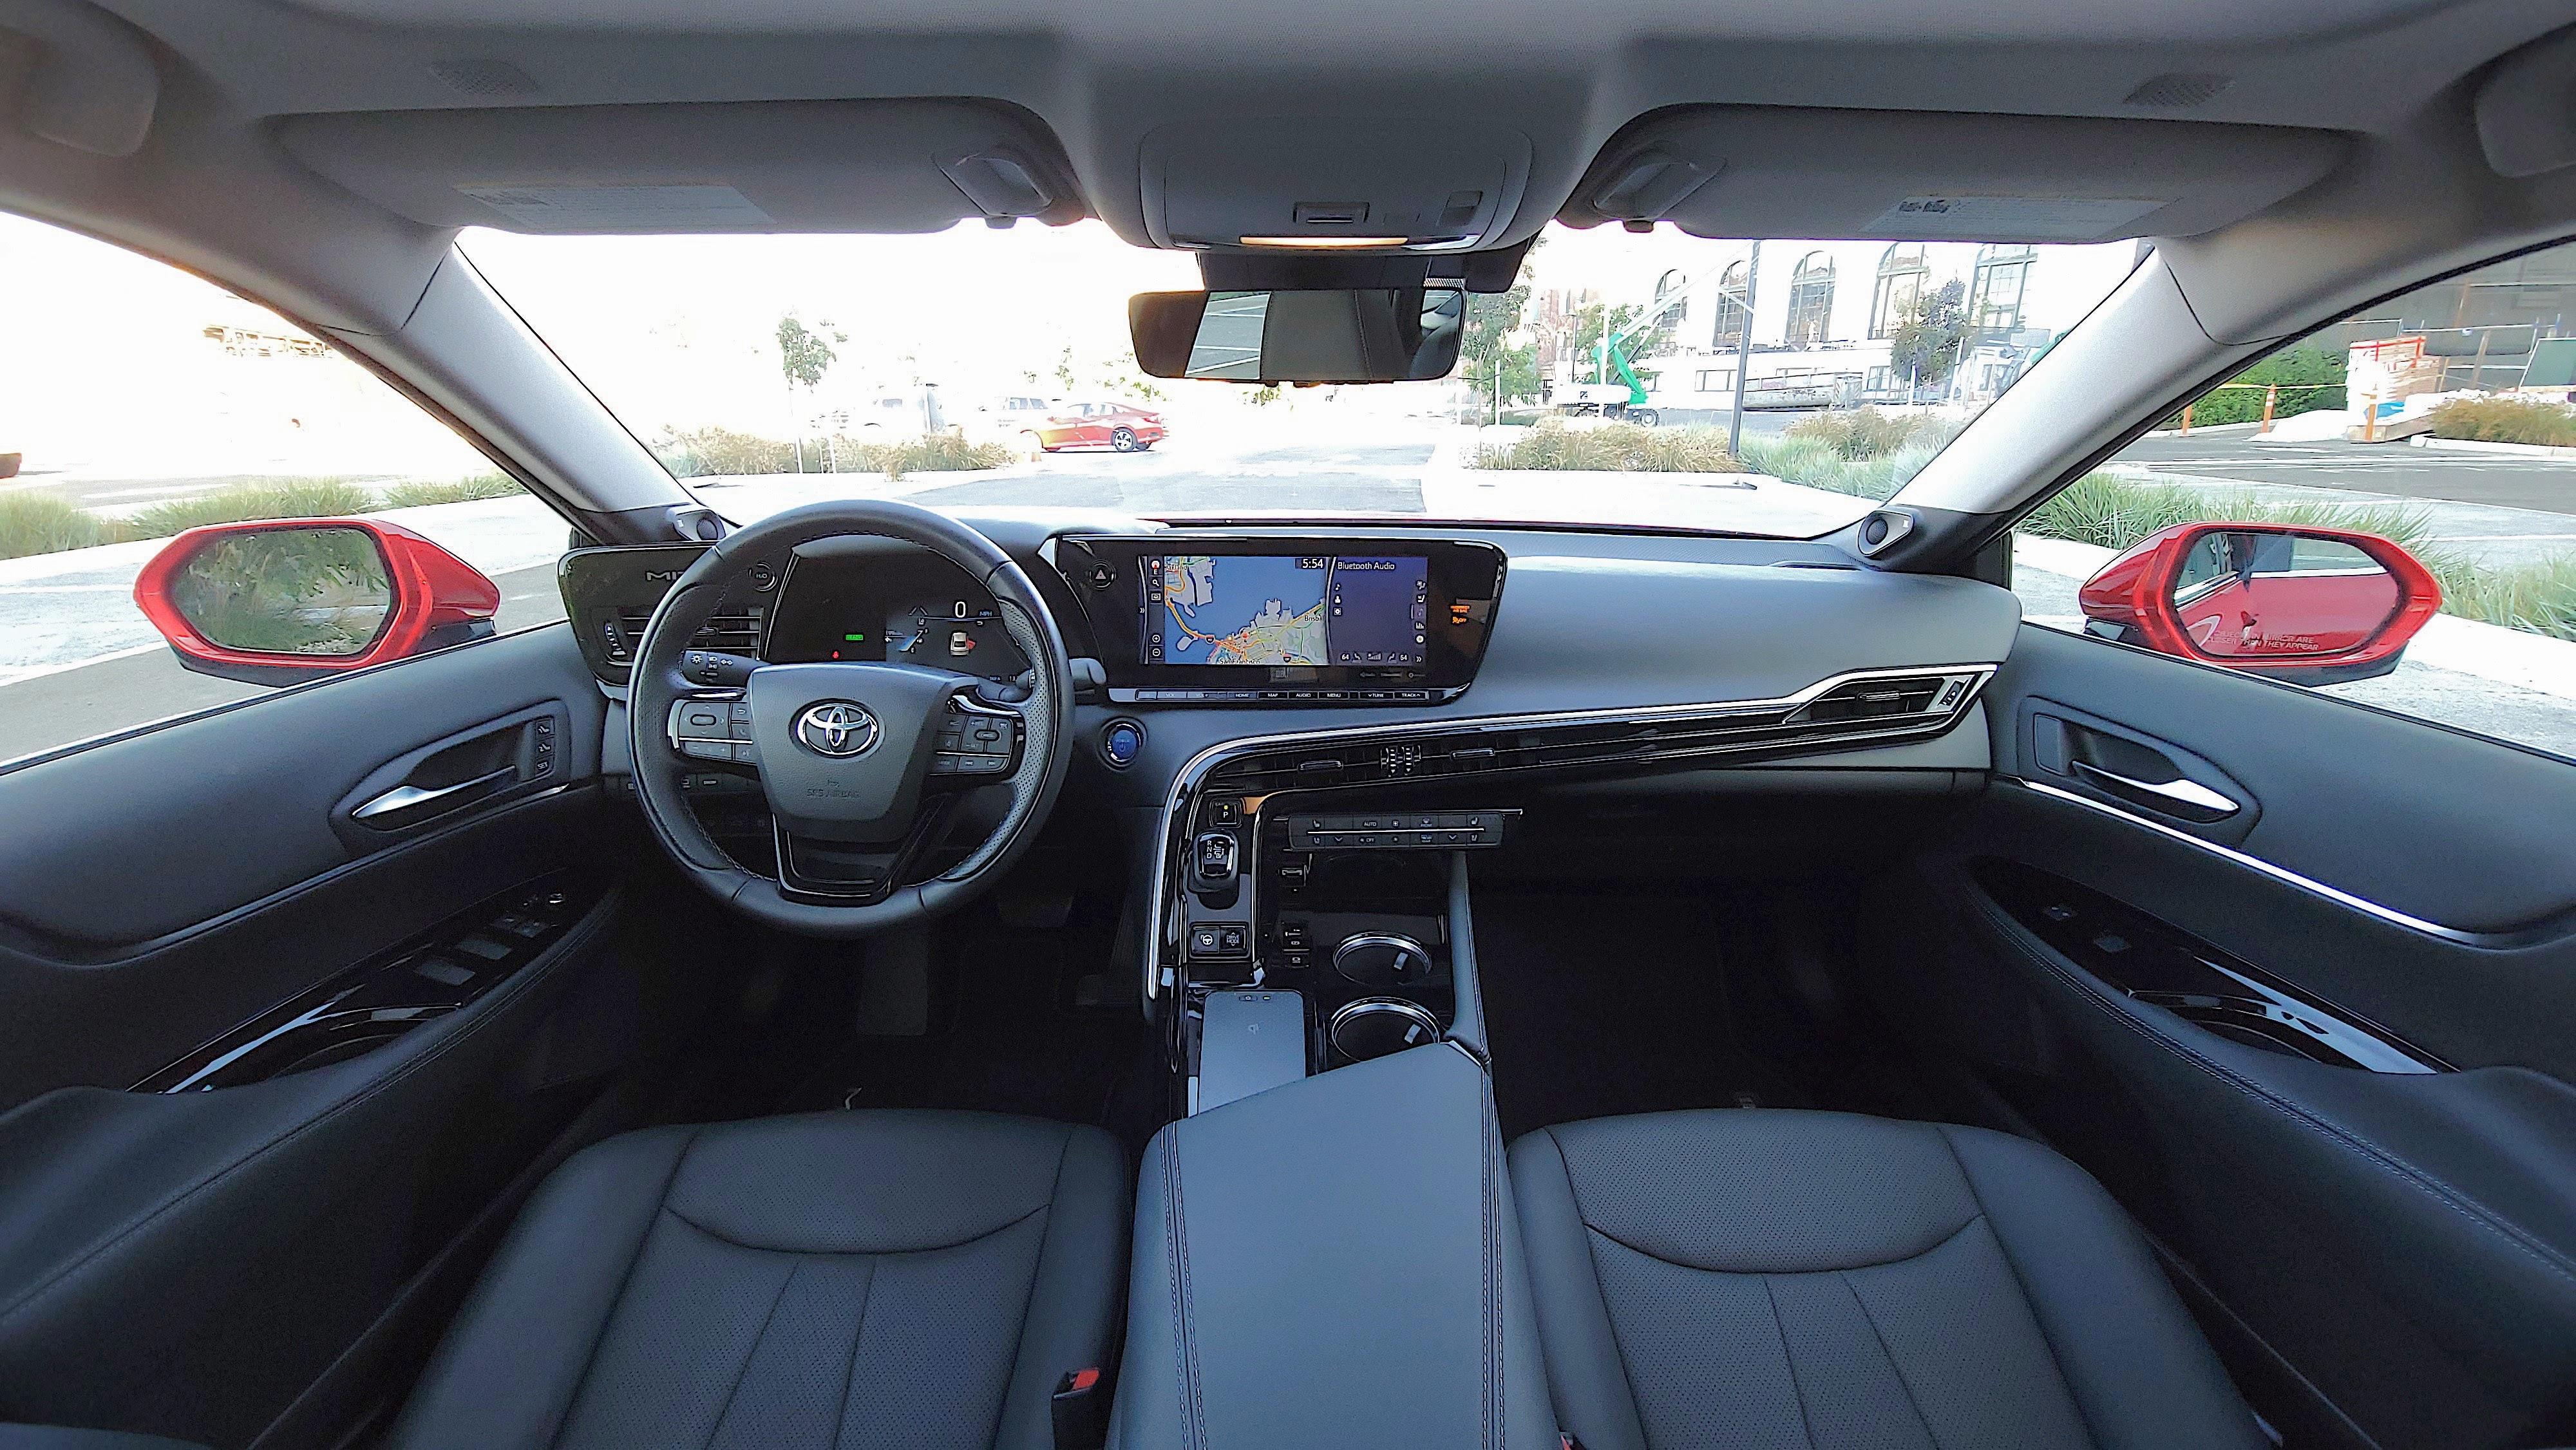 View of full width of dash in the Toyota Mirai (2021)